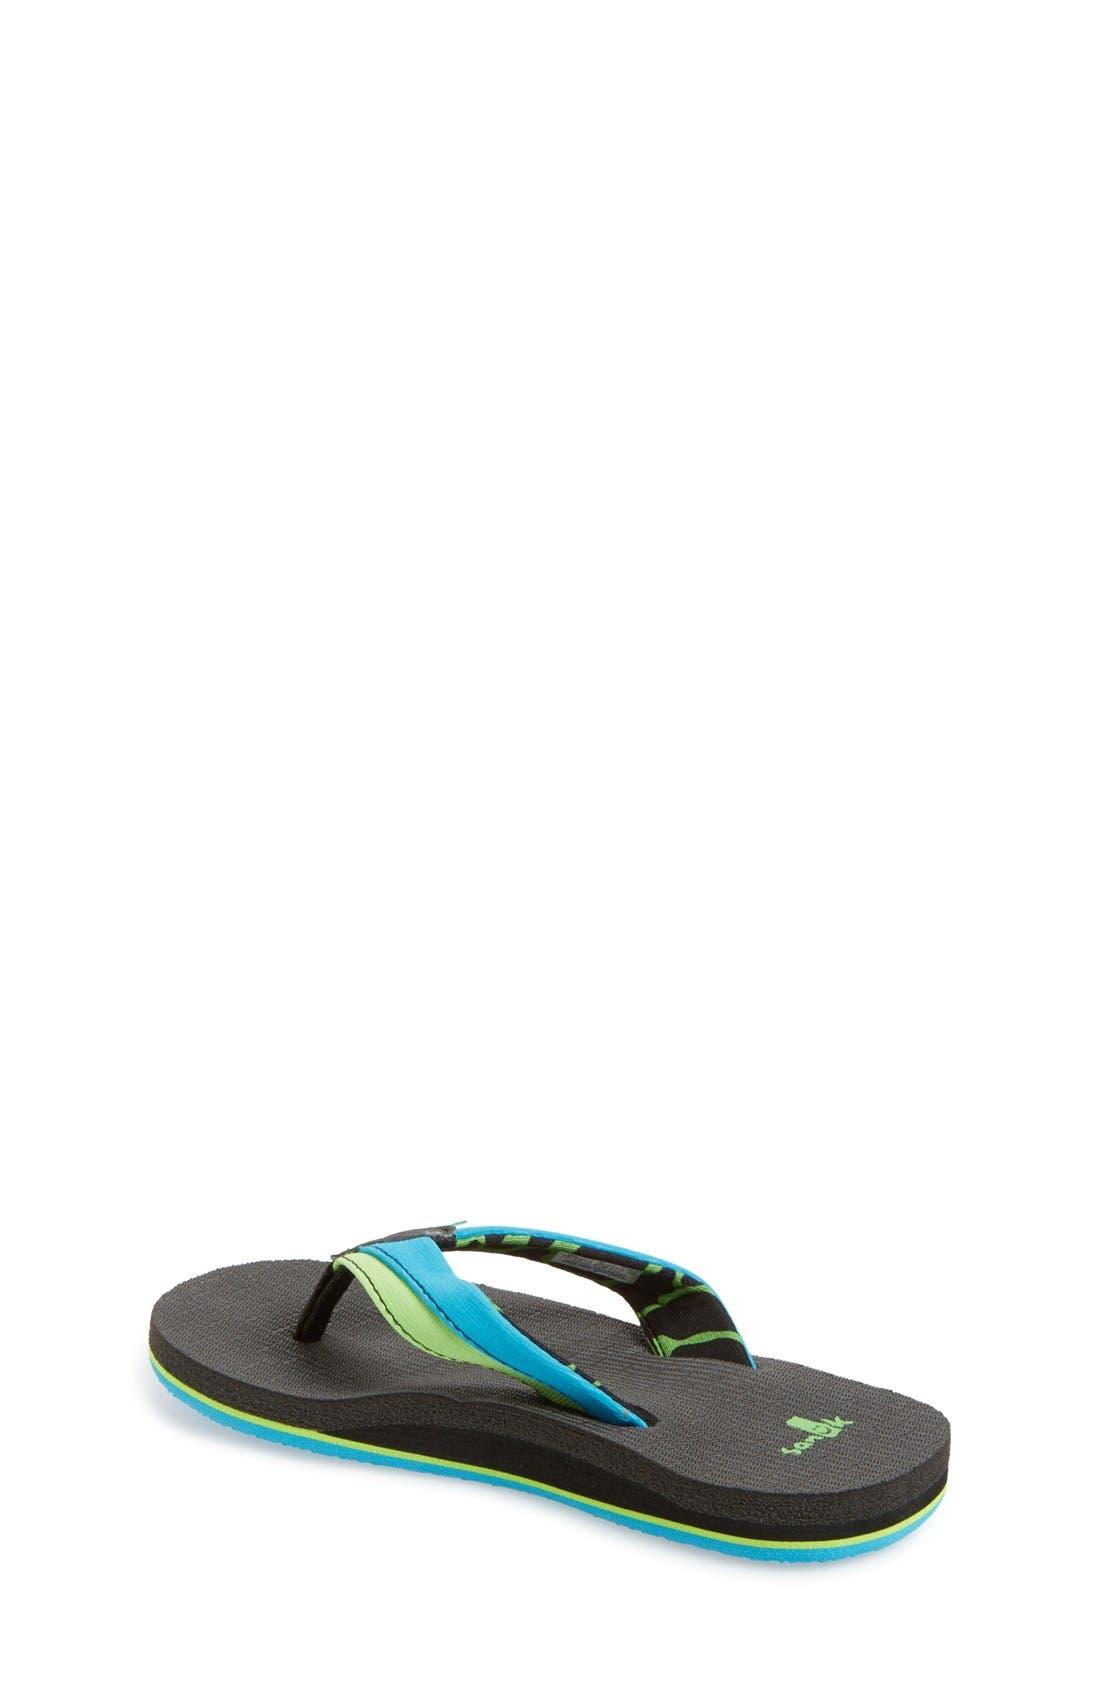 'Rootbeer Cozy' Lightweight Flip Flop Sandal,                             Alternate thumbnail 21, color,